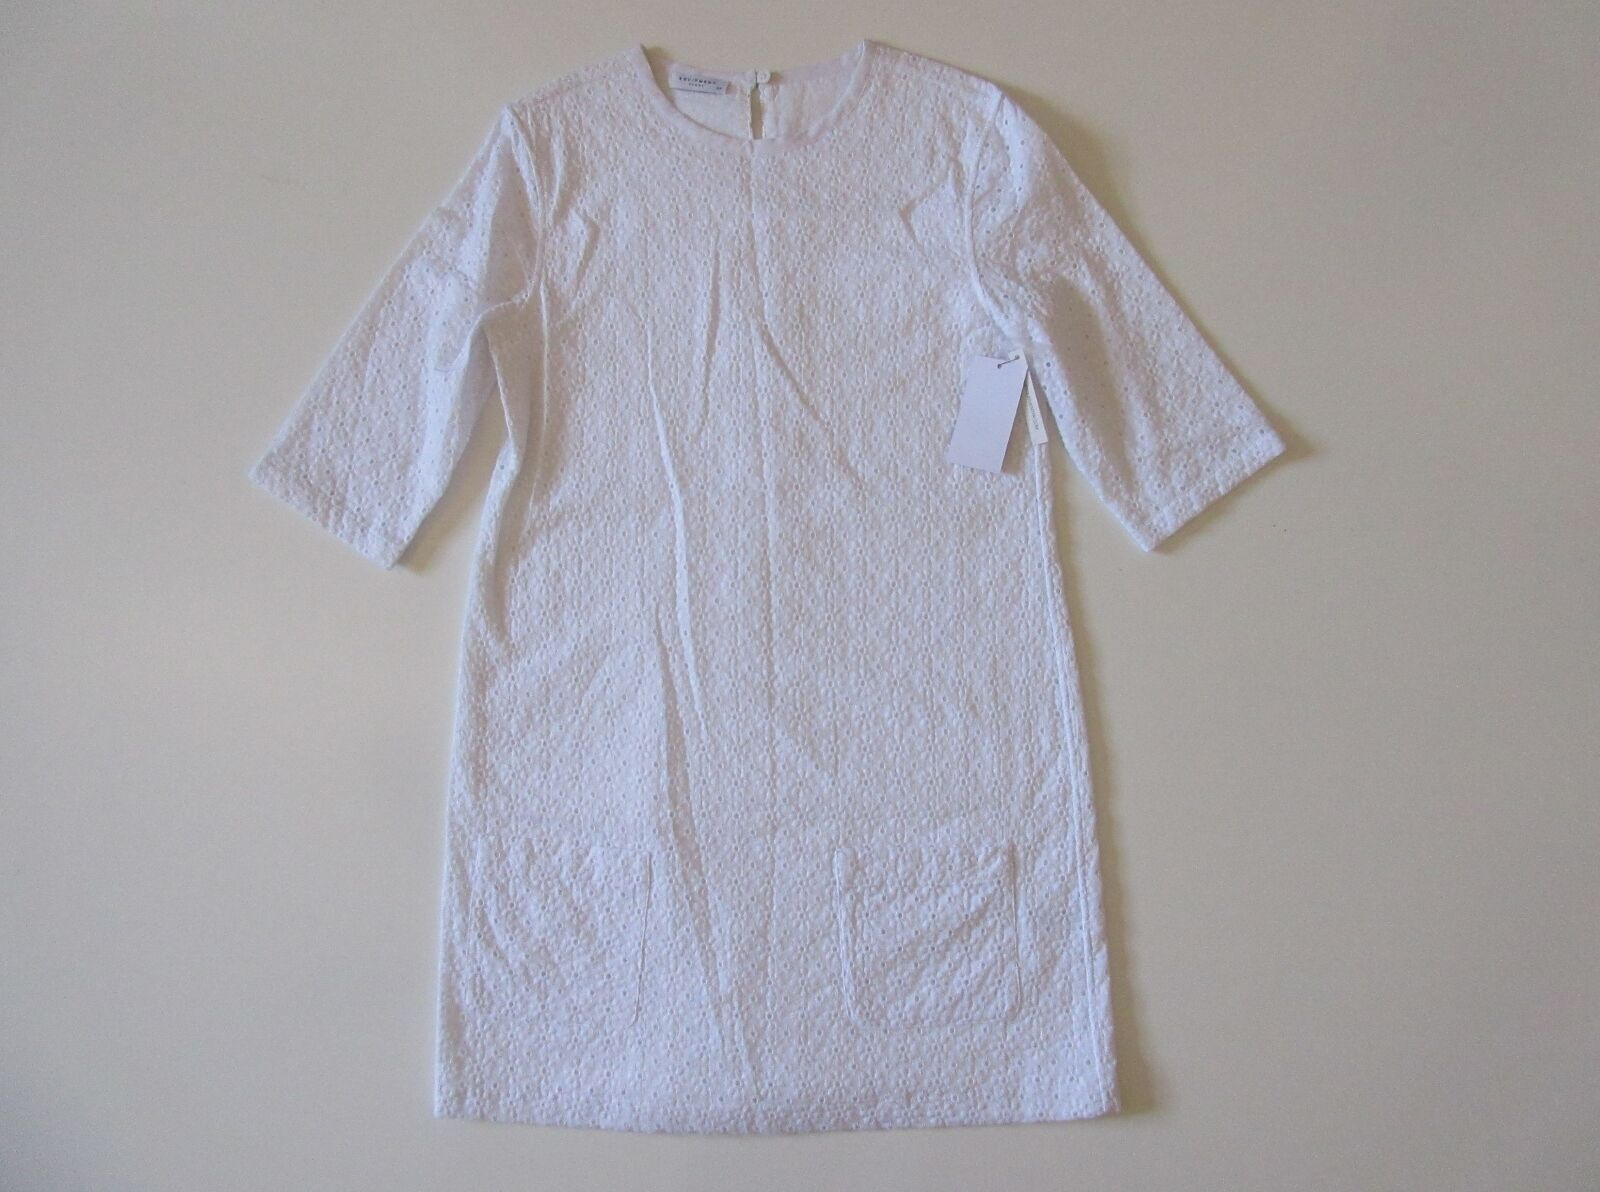 NWT Equipment Aubrey in White Floral Eyelet Eyelet Eyelet Short Sleeve Shift Dress S  268 2f9162